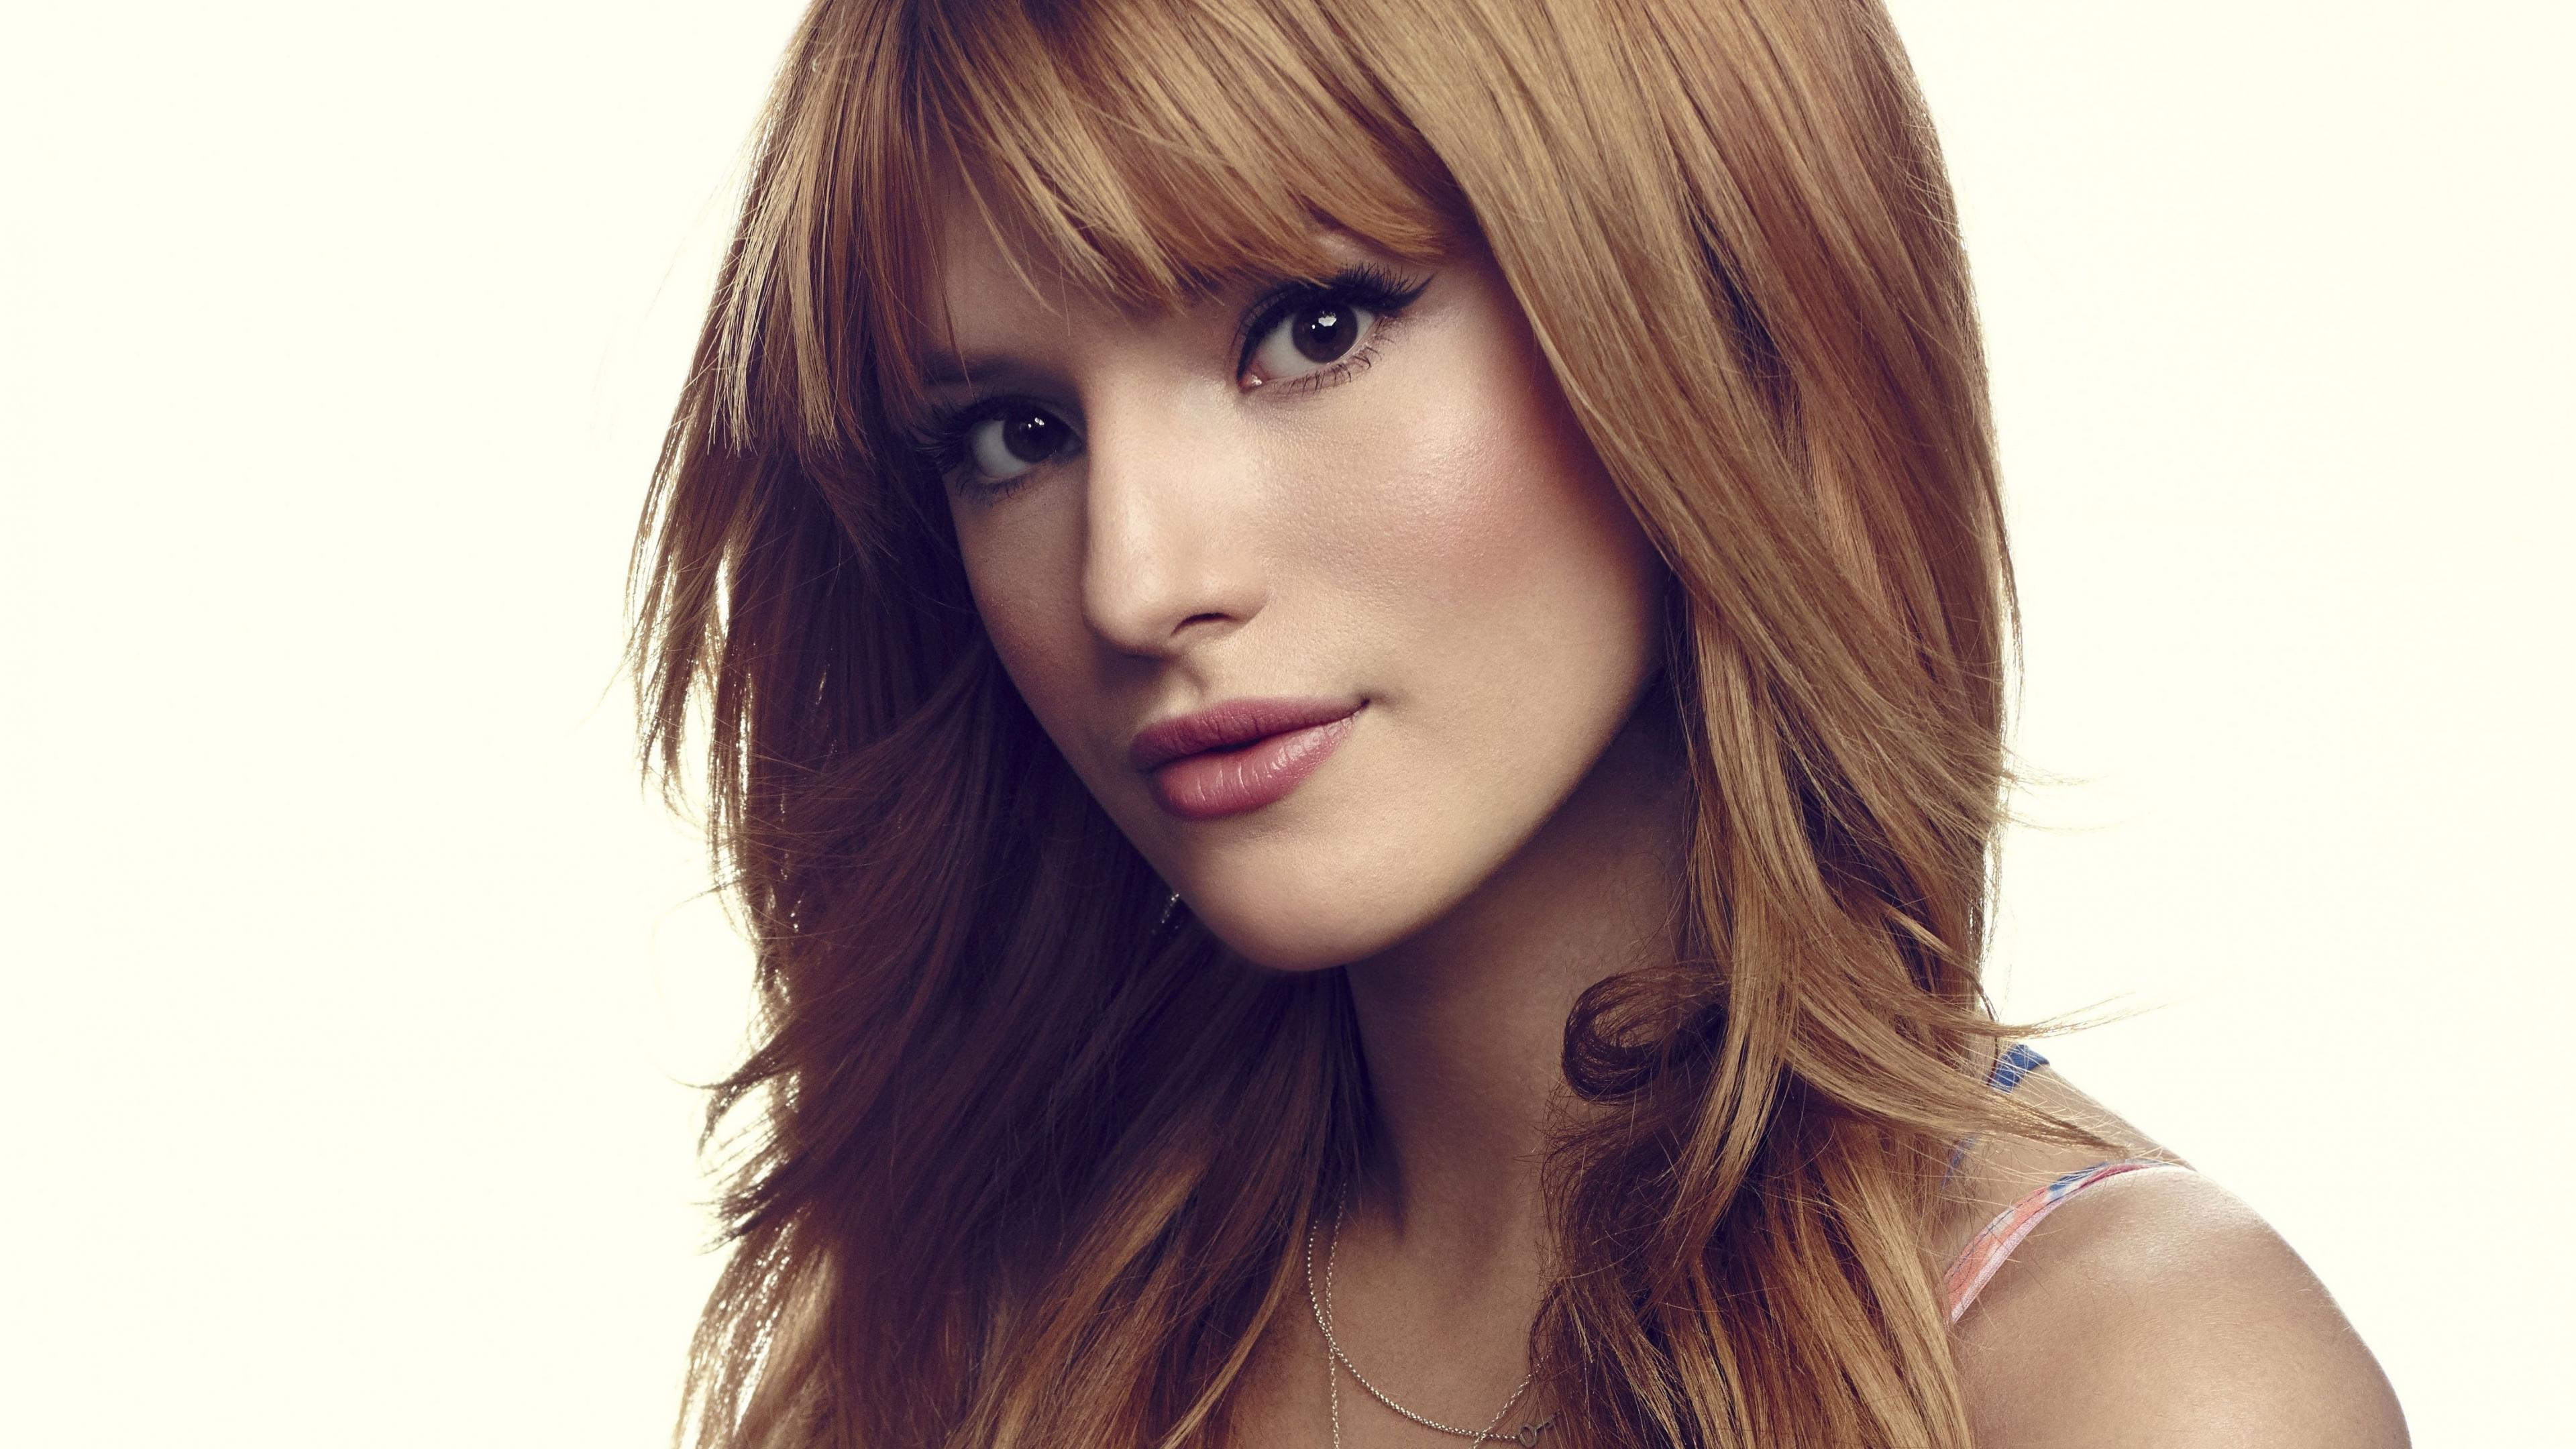 Download 3840x2160 Wallpaper Bella Thorne Beautiful Elle